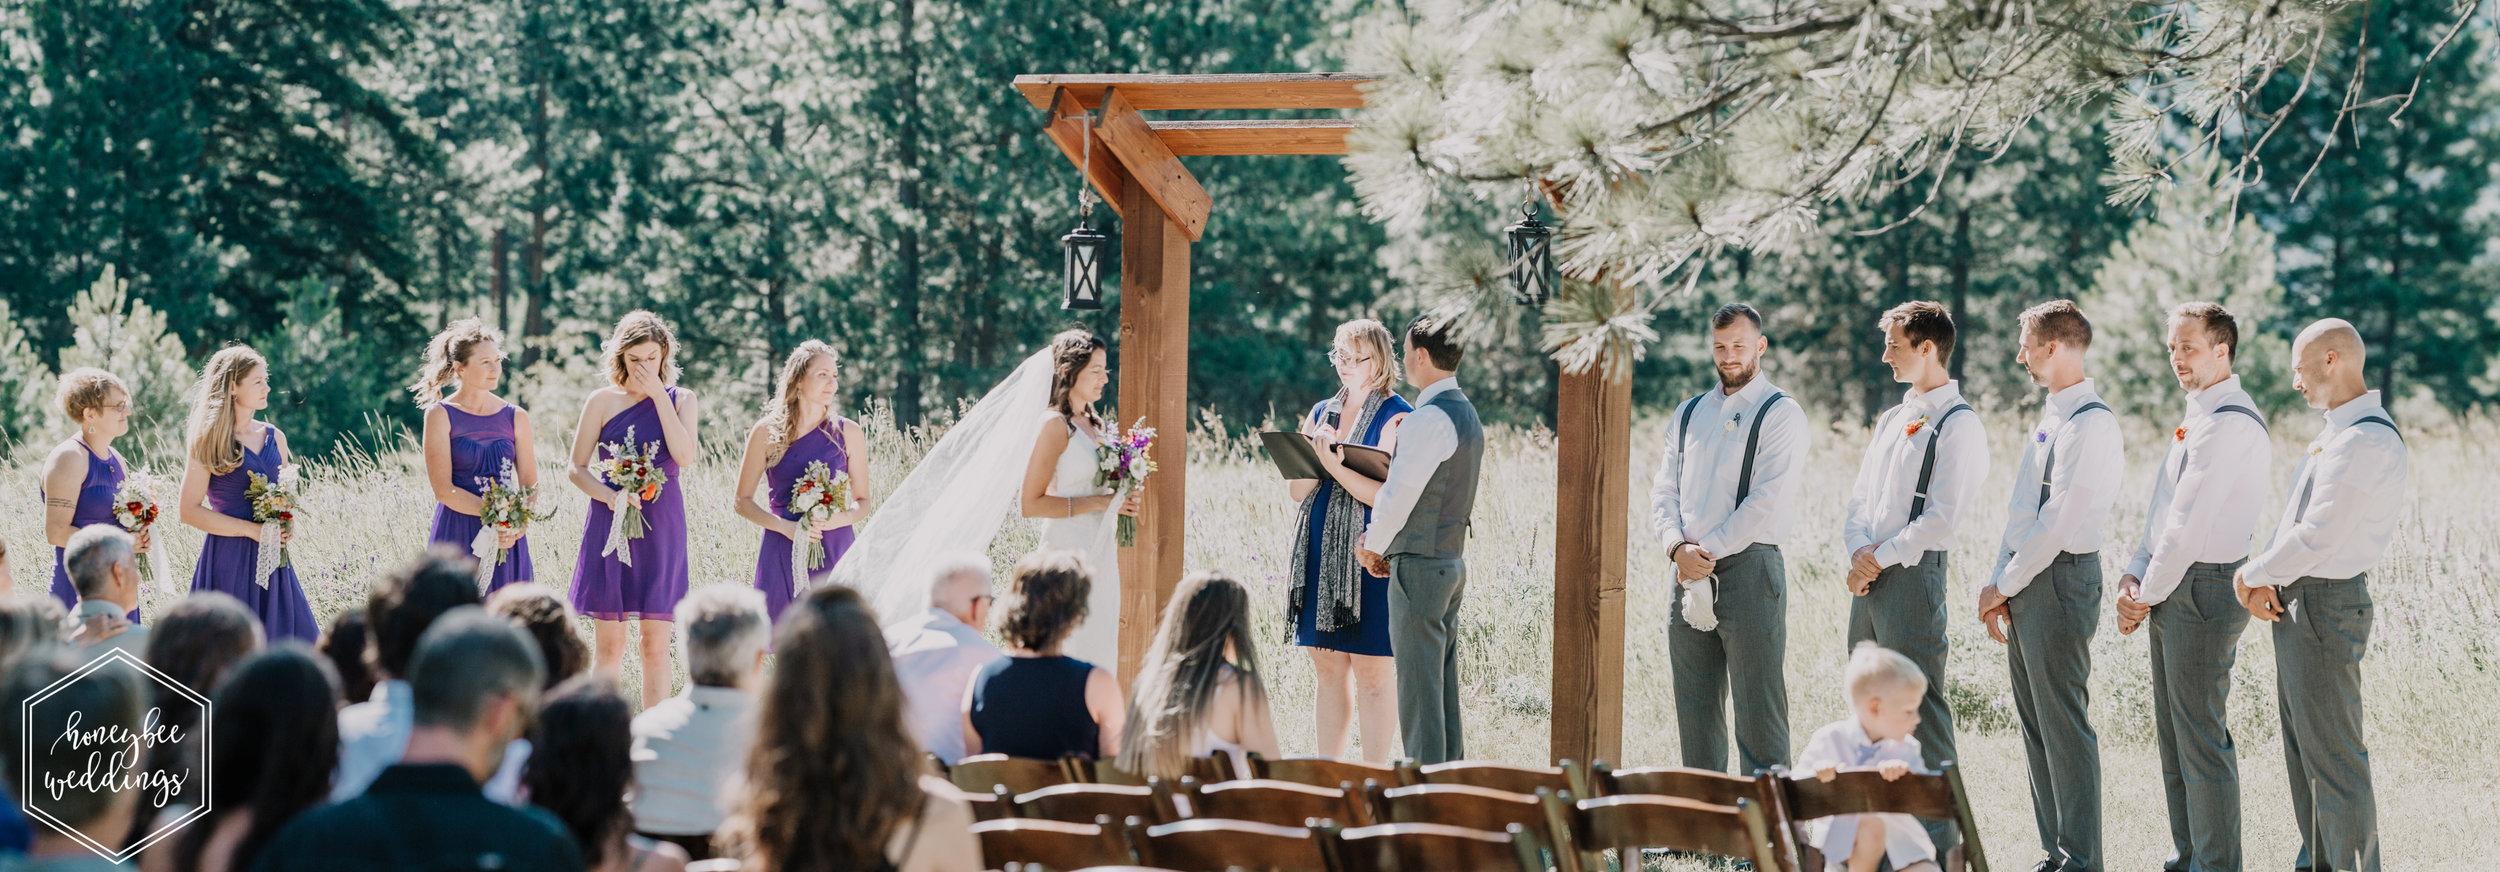 320 White Raven Wedding_Montana Wedding Photographer_Honeybee Weddings_ Meghan Maloney + Arza Hammond 2018-8740-Pano.jpg